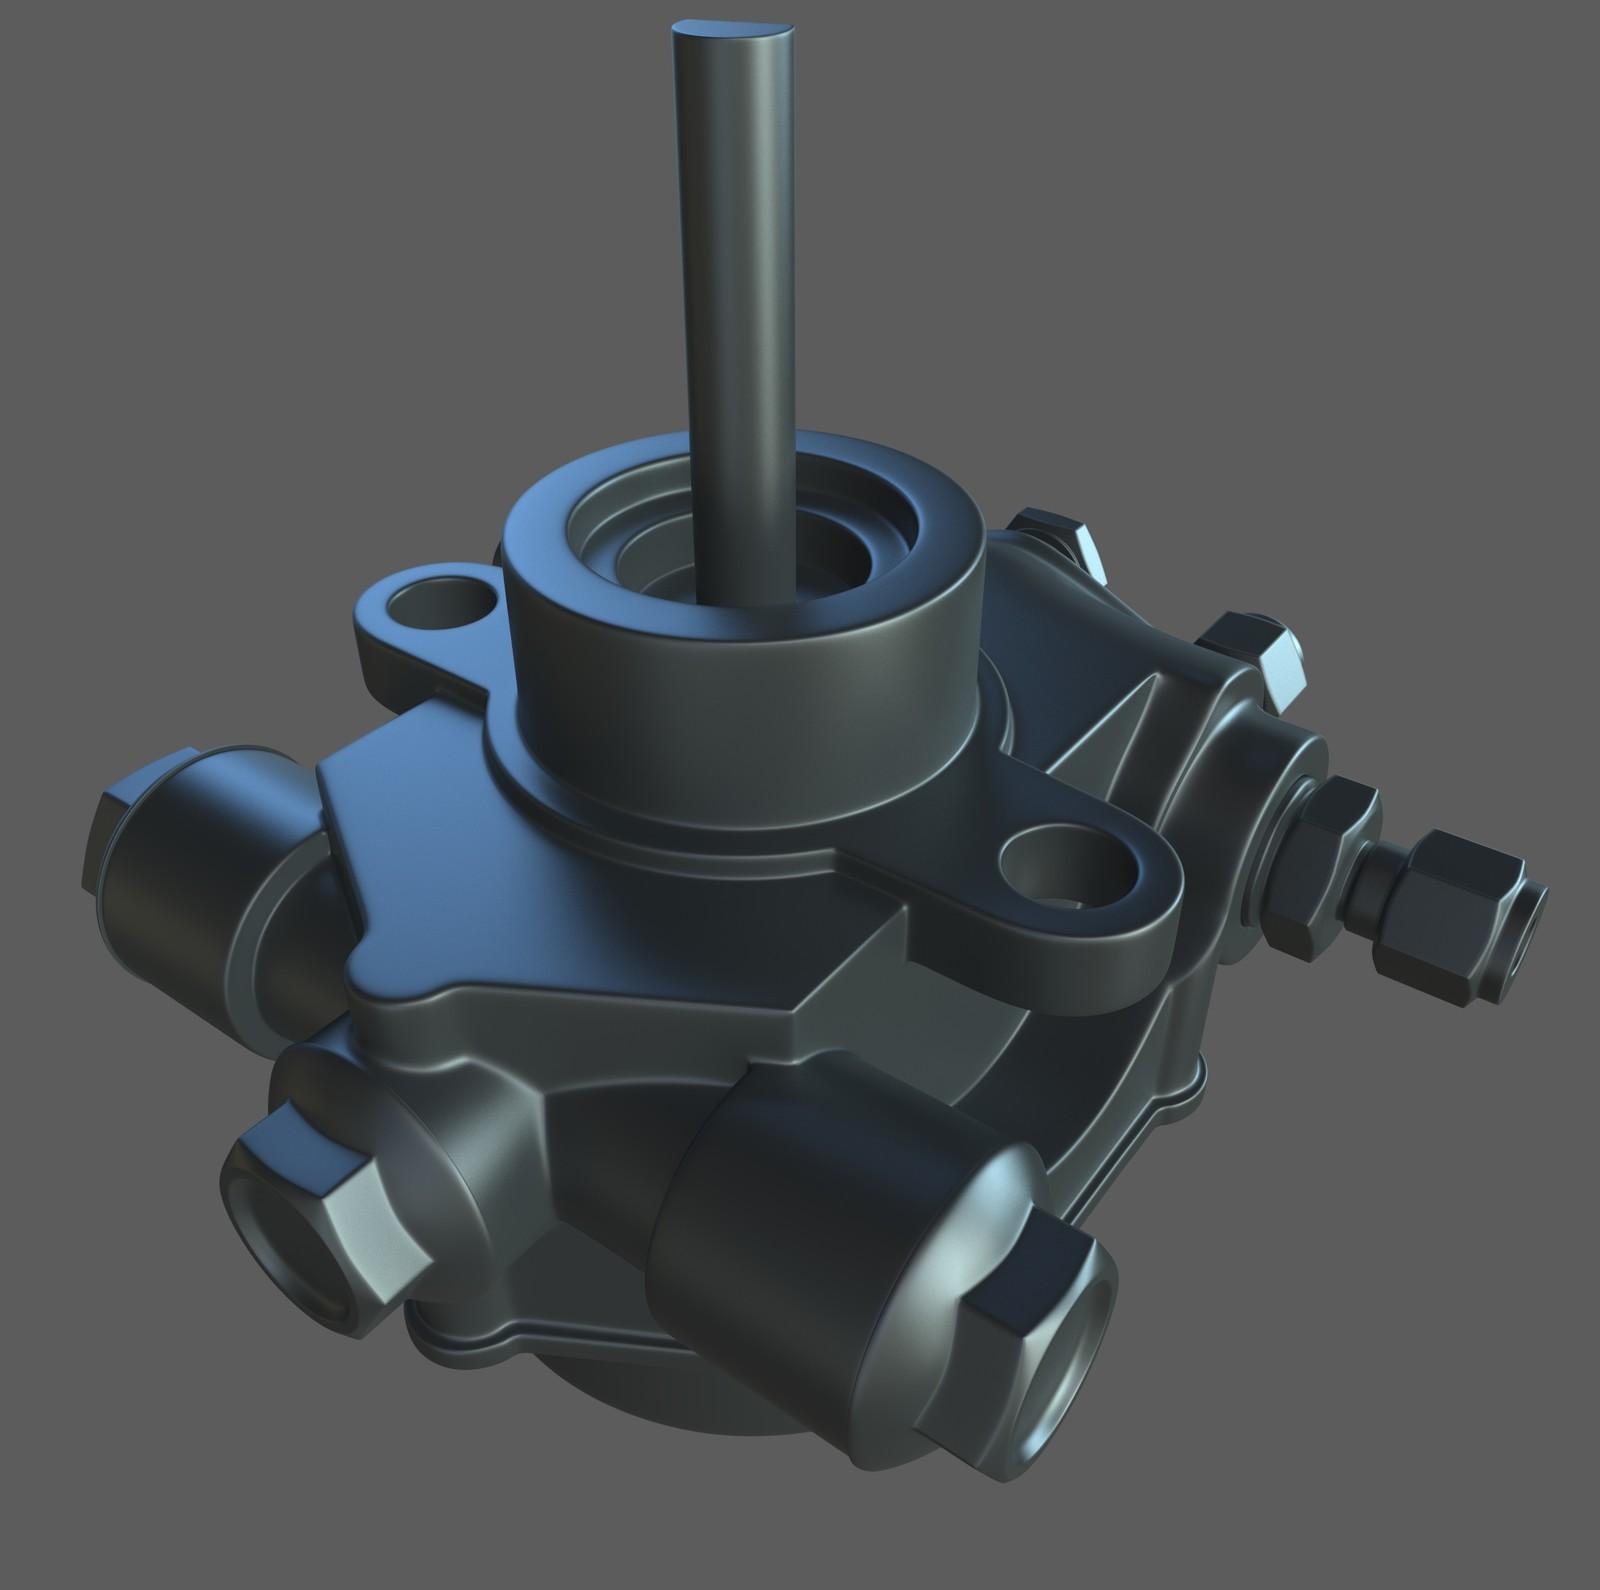 Hard Surface Study - Fuel Pump